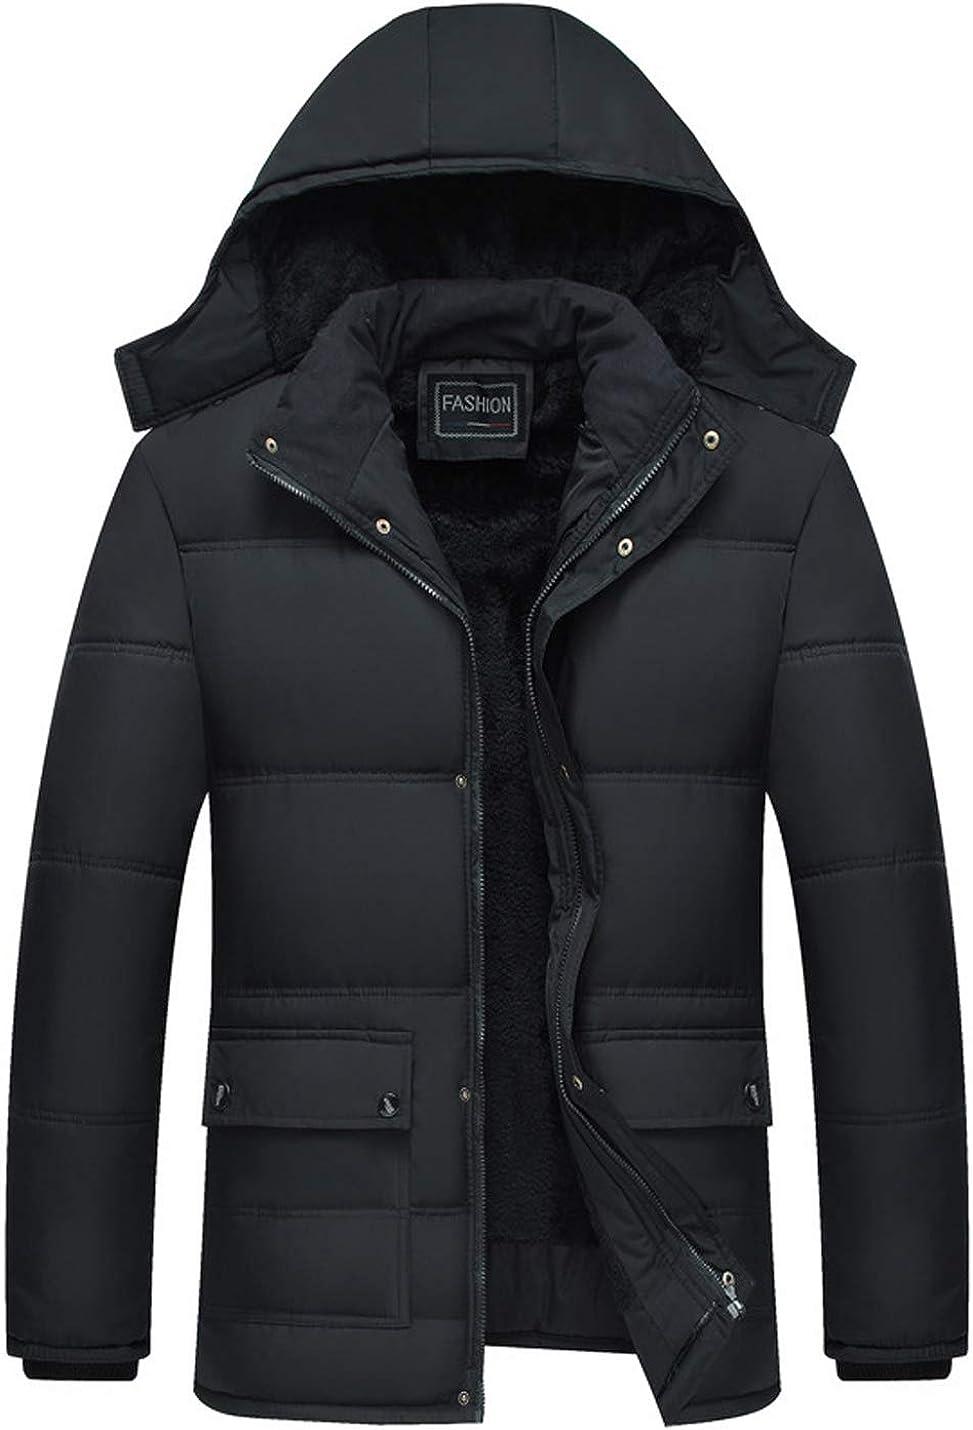 Gihuo Men's Warm Padded Fleece Lined Jacket Parka with Hood